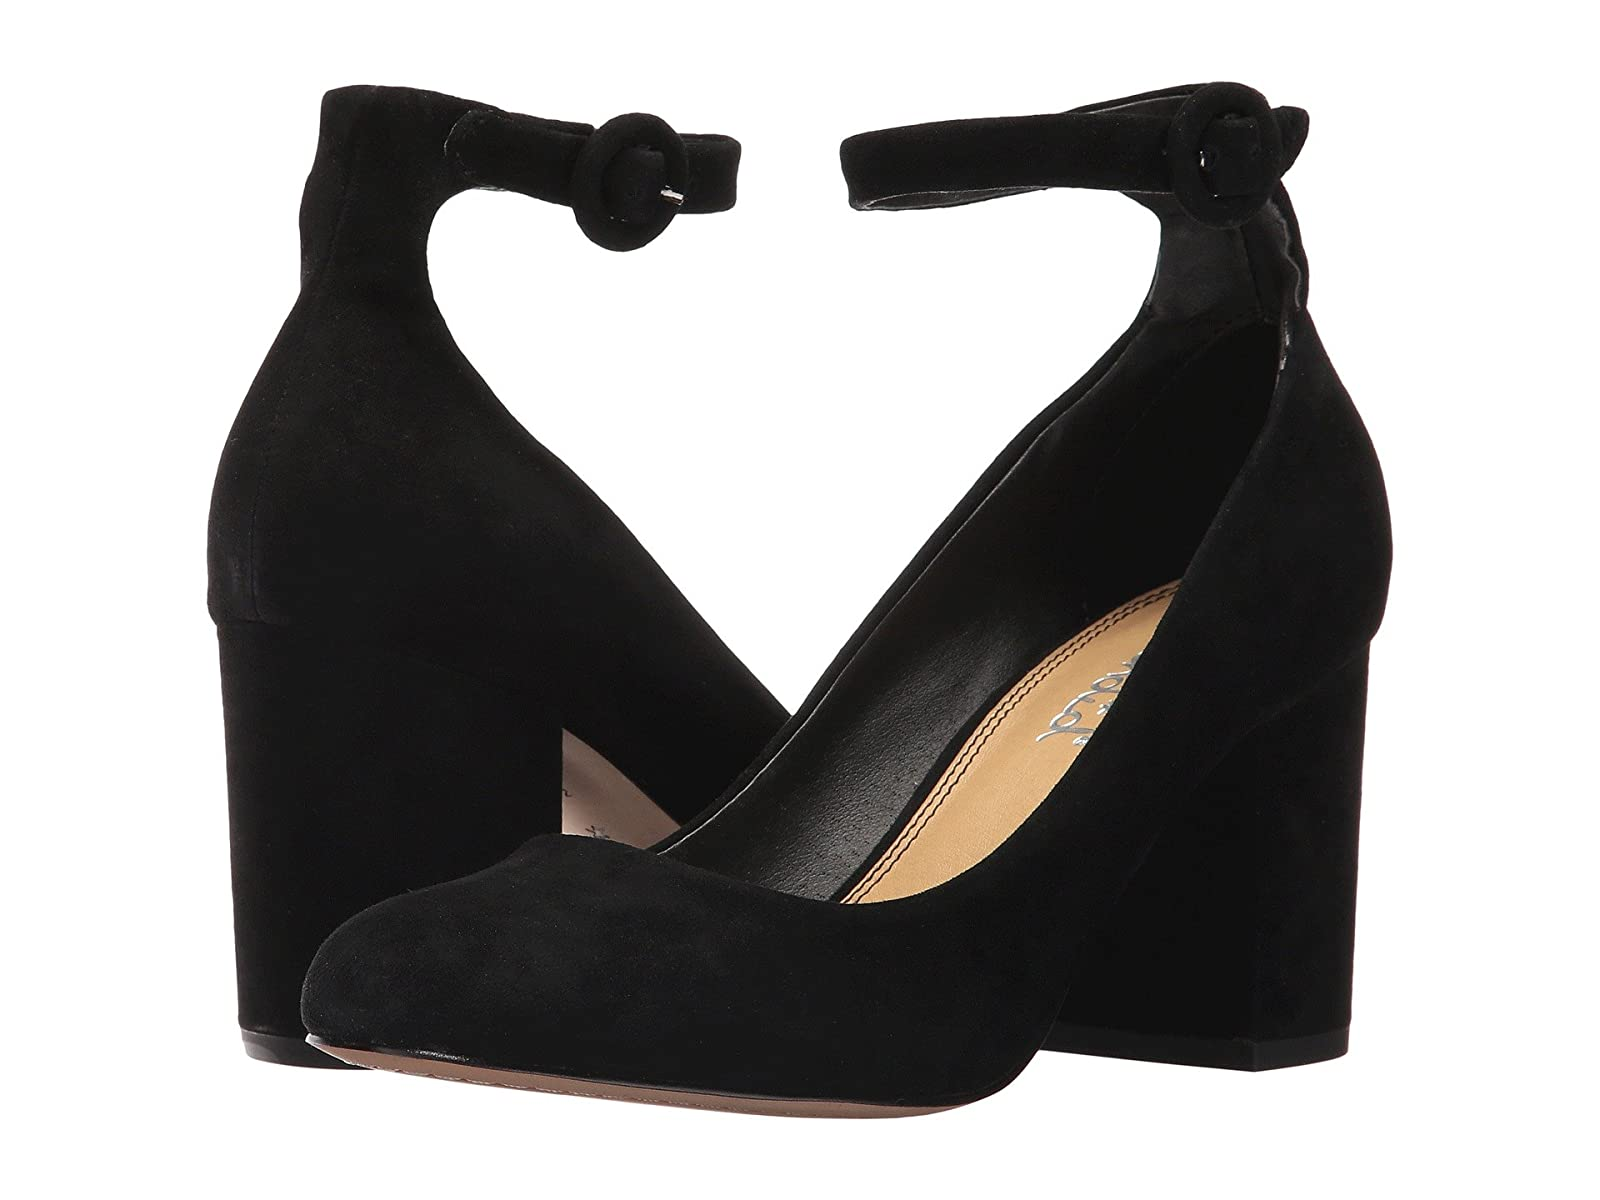 Splendid RosieCheap and distinctive eye-catching shoes